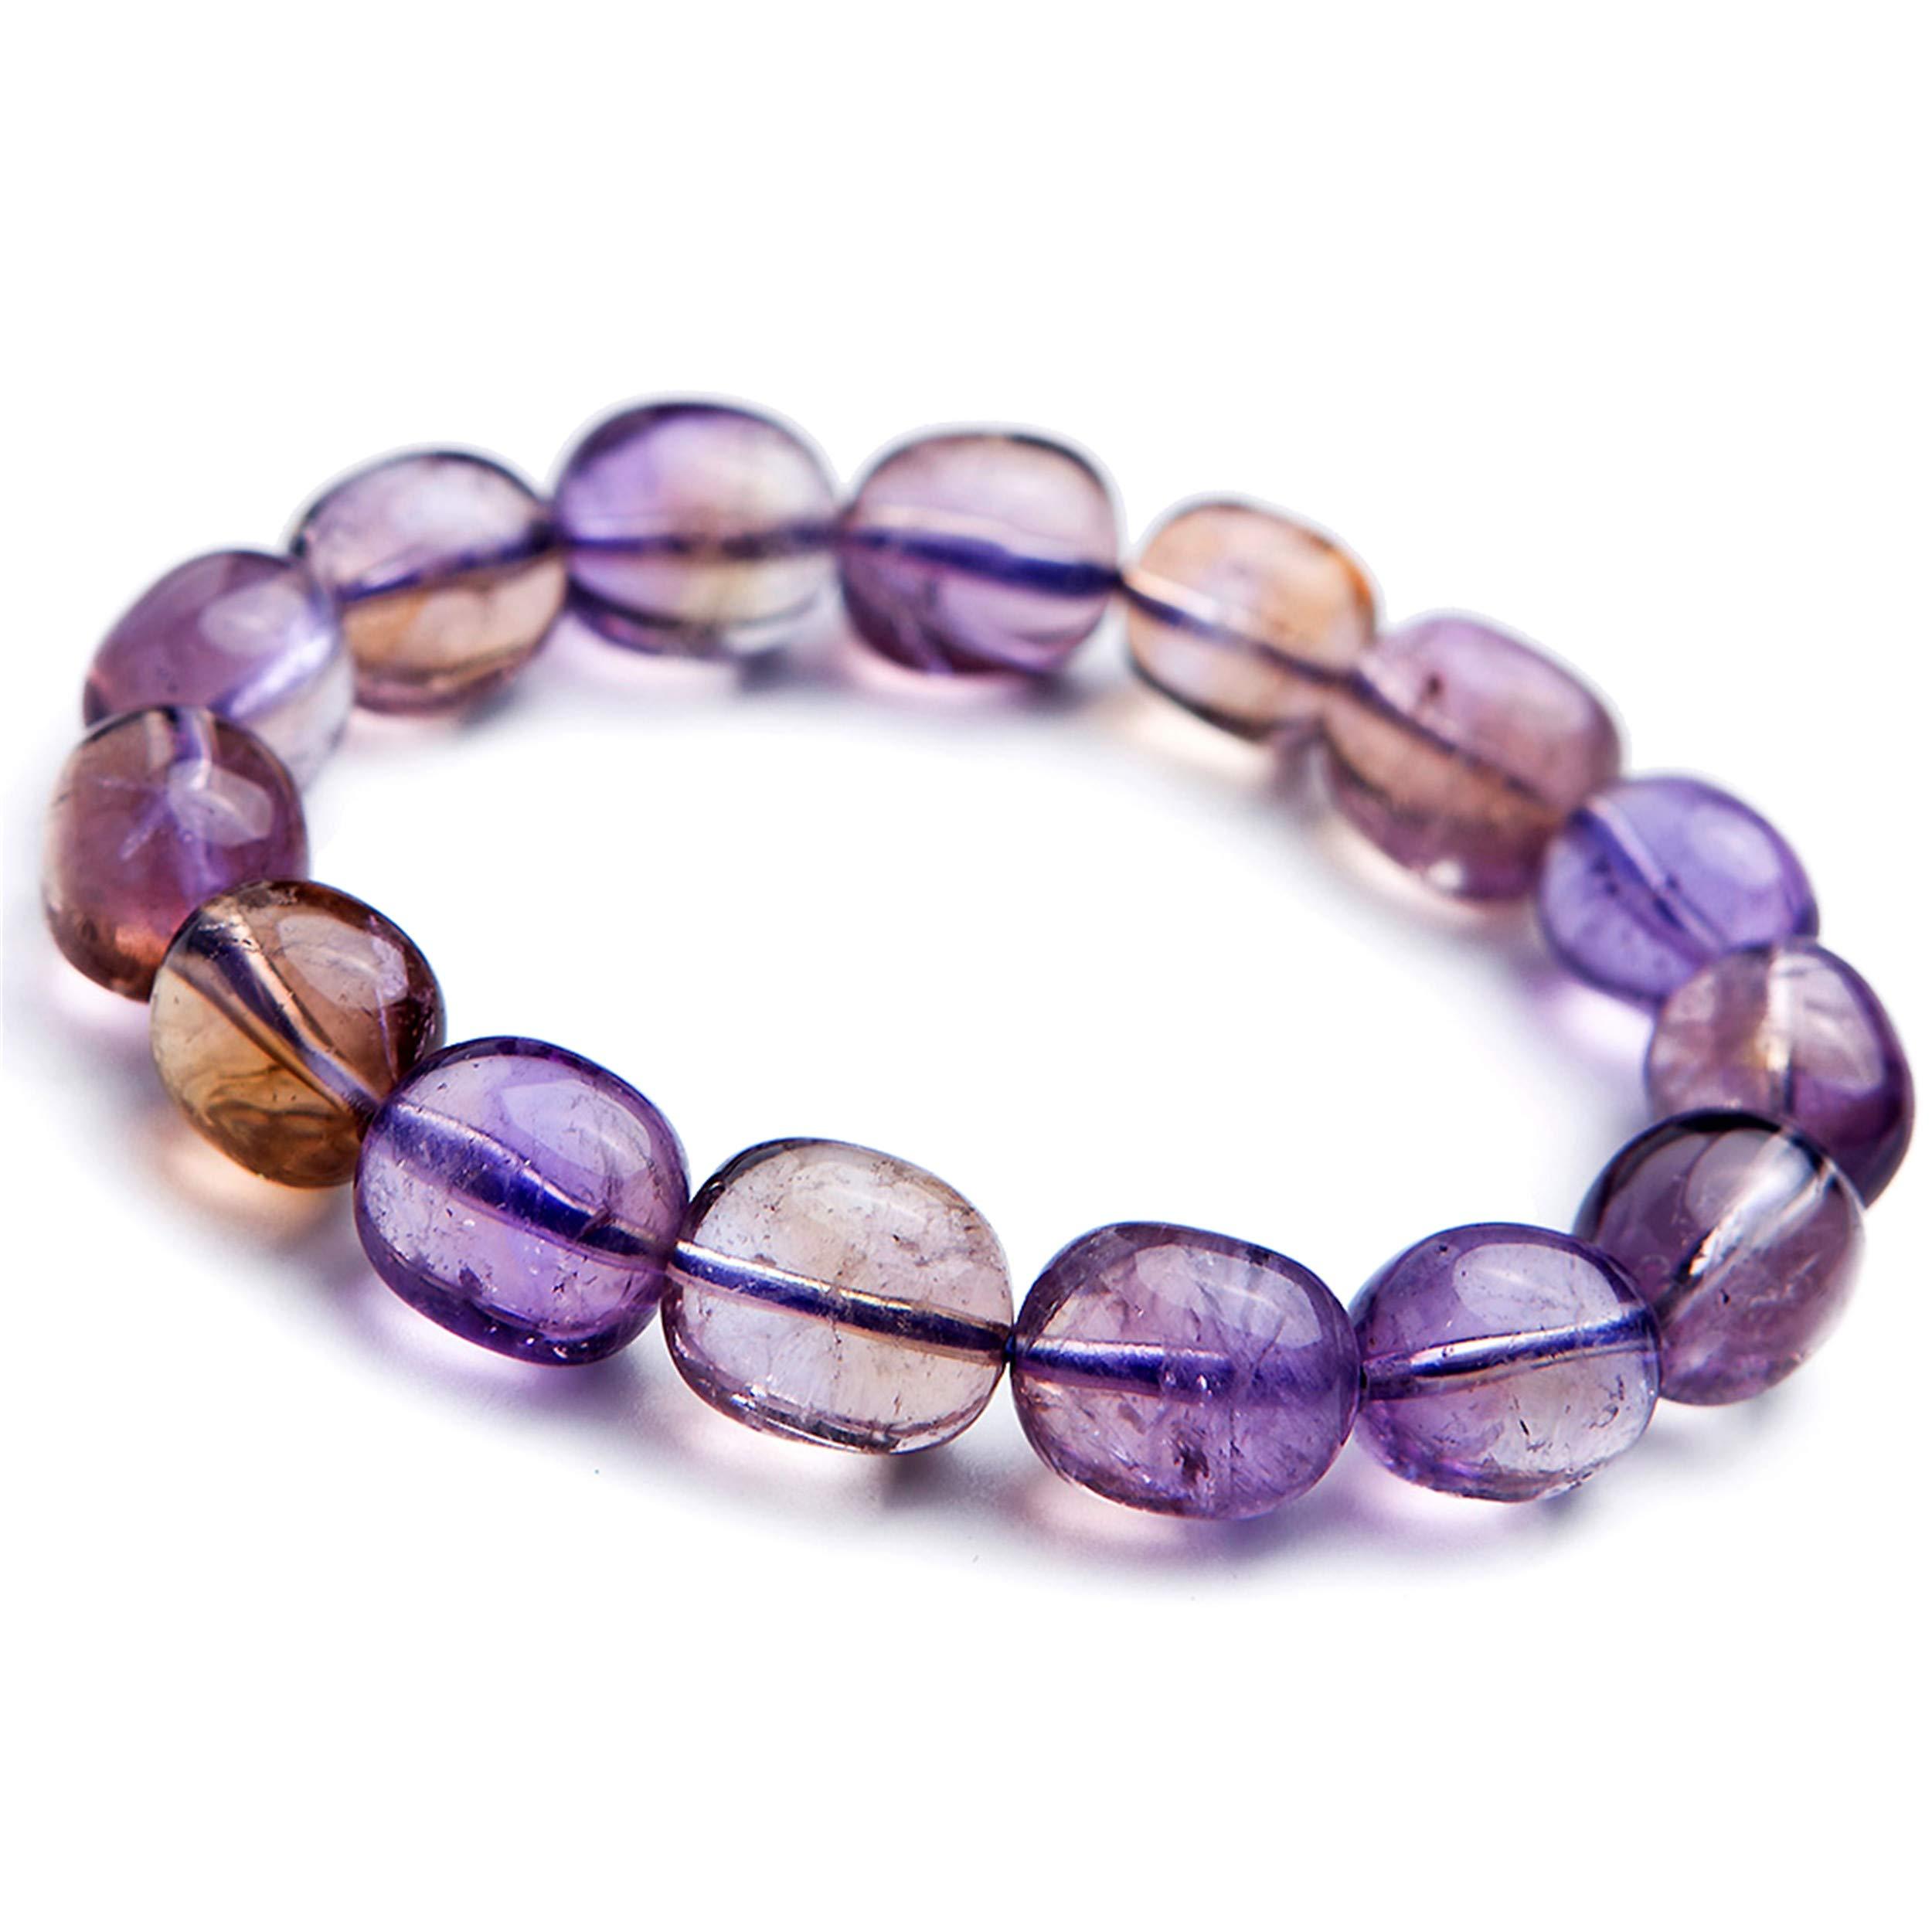 Yellow Purple Natural Ametrine Amethyst Citrine Quartz Crystal Bead Bracelet